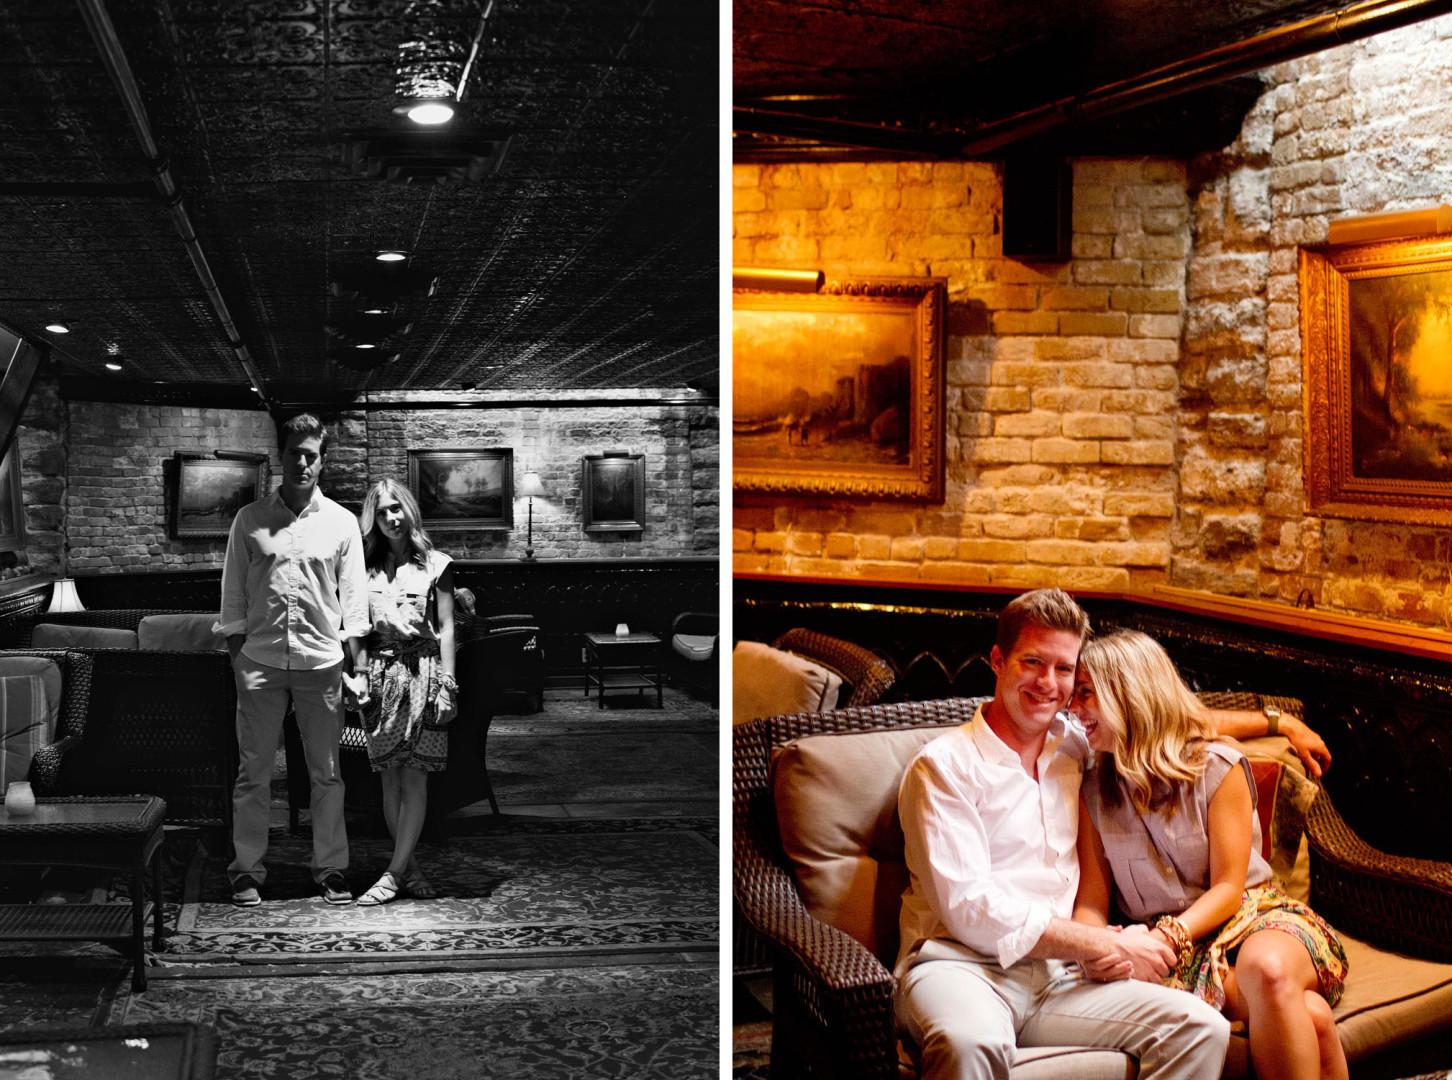 DesireeMostad_StPaulEngagementPhoto, DesireeMostad_W.A. Frost, St.Paul, Minnesota